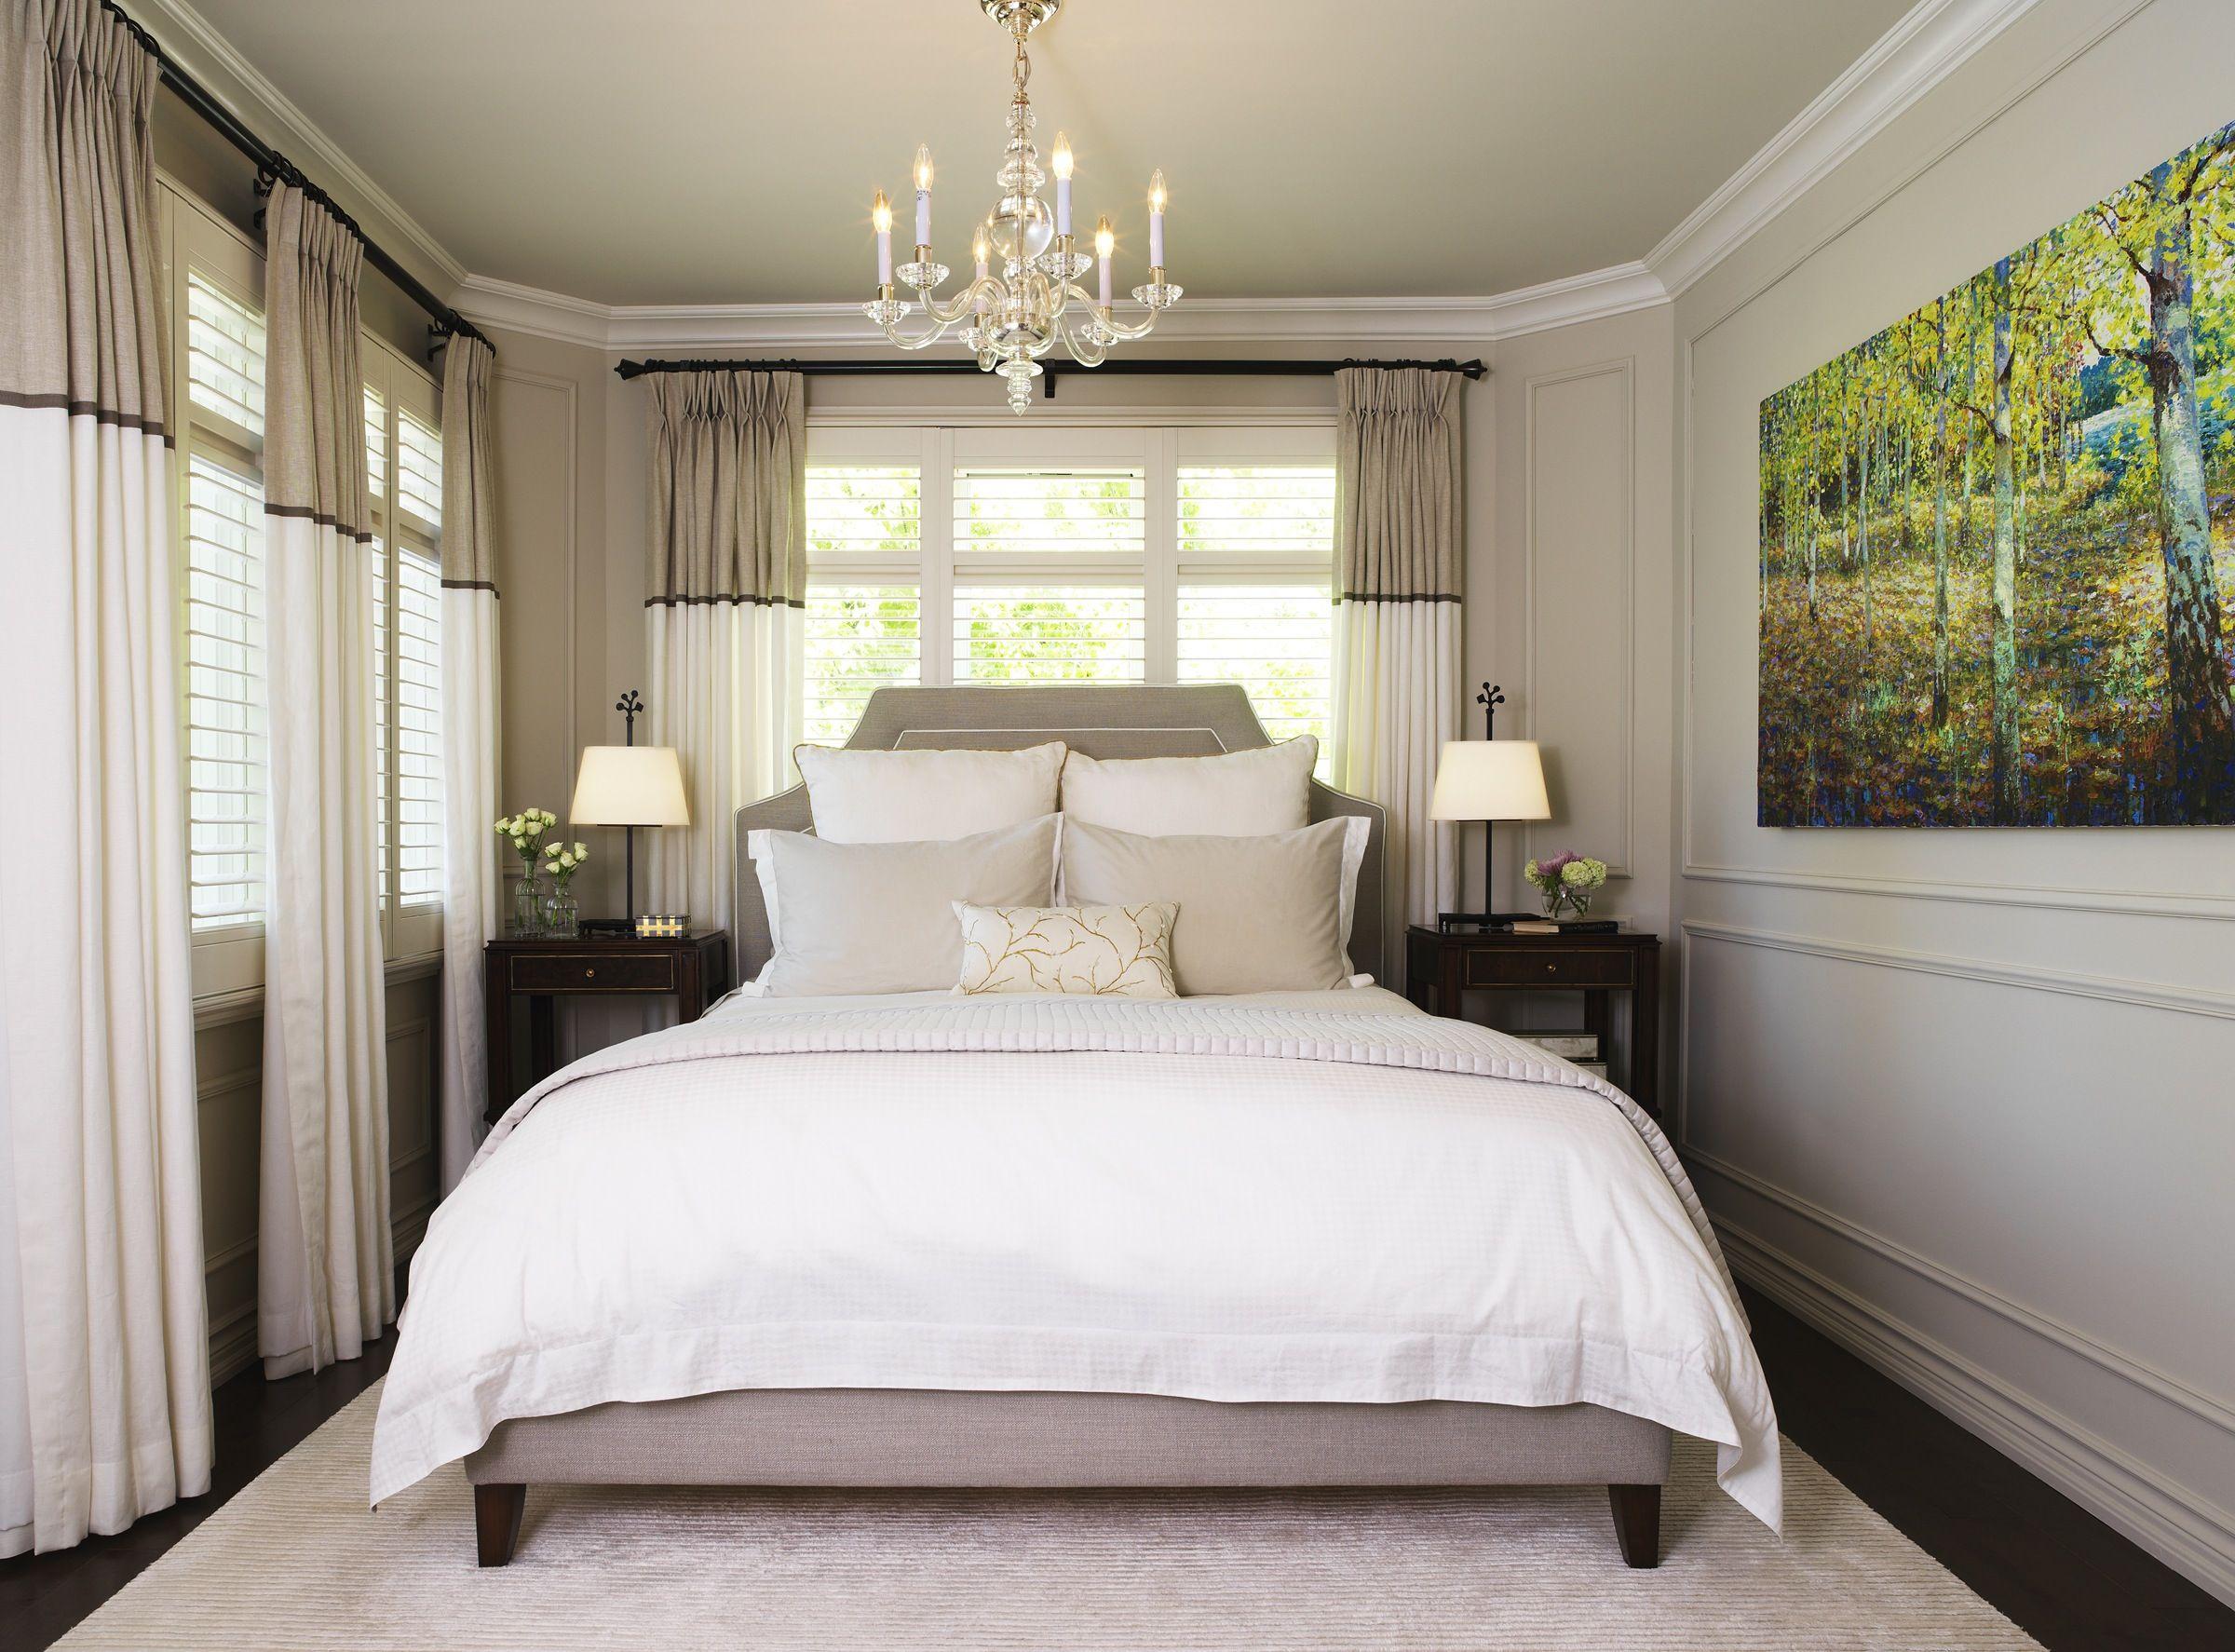 room design master bedroom Ideas For Decorating a Small Master Bedroom 782633e6f29d87da02f3fde85b26ee18